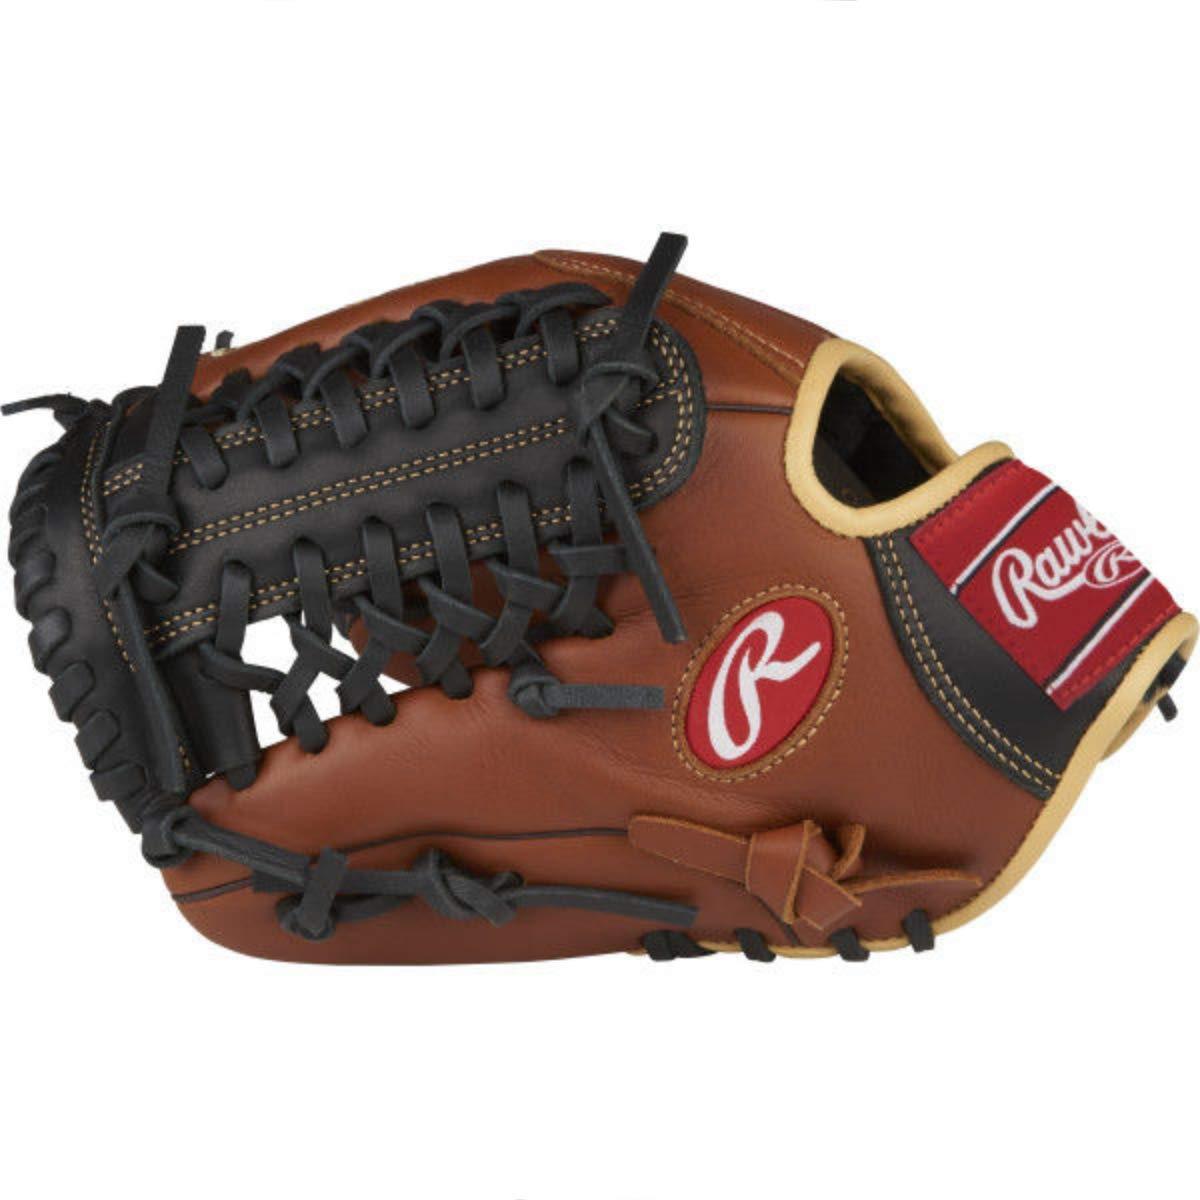 Rawlings Sandlot Series Infield//Pitcher Glove 11.75